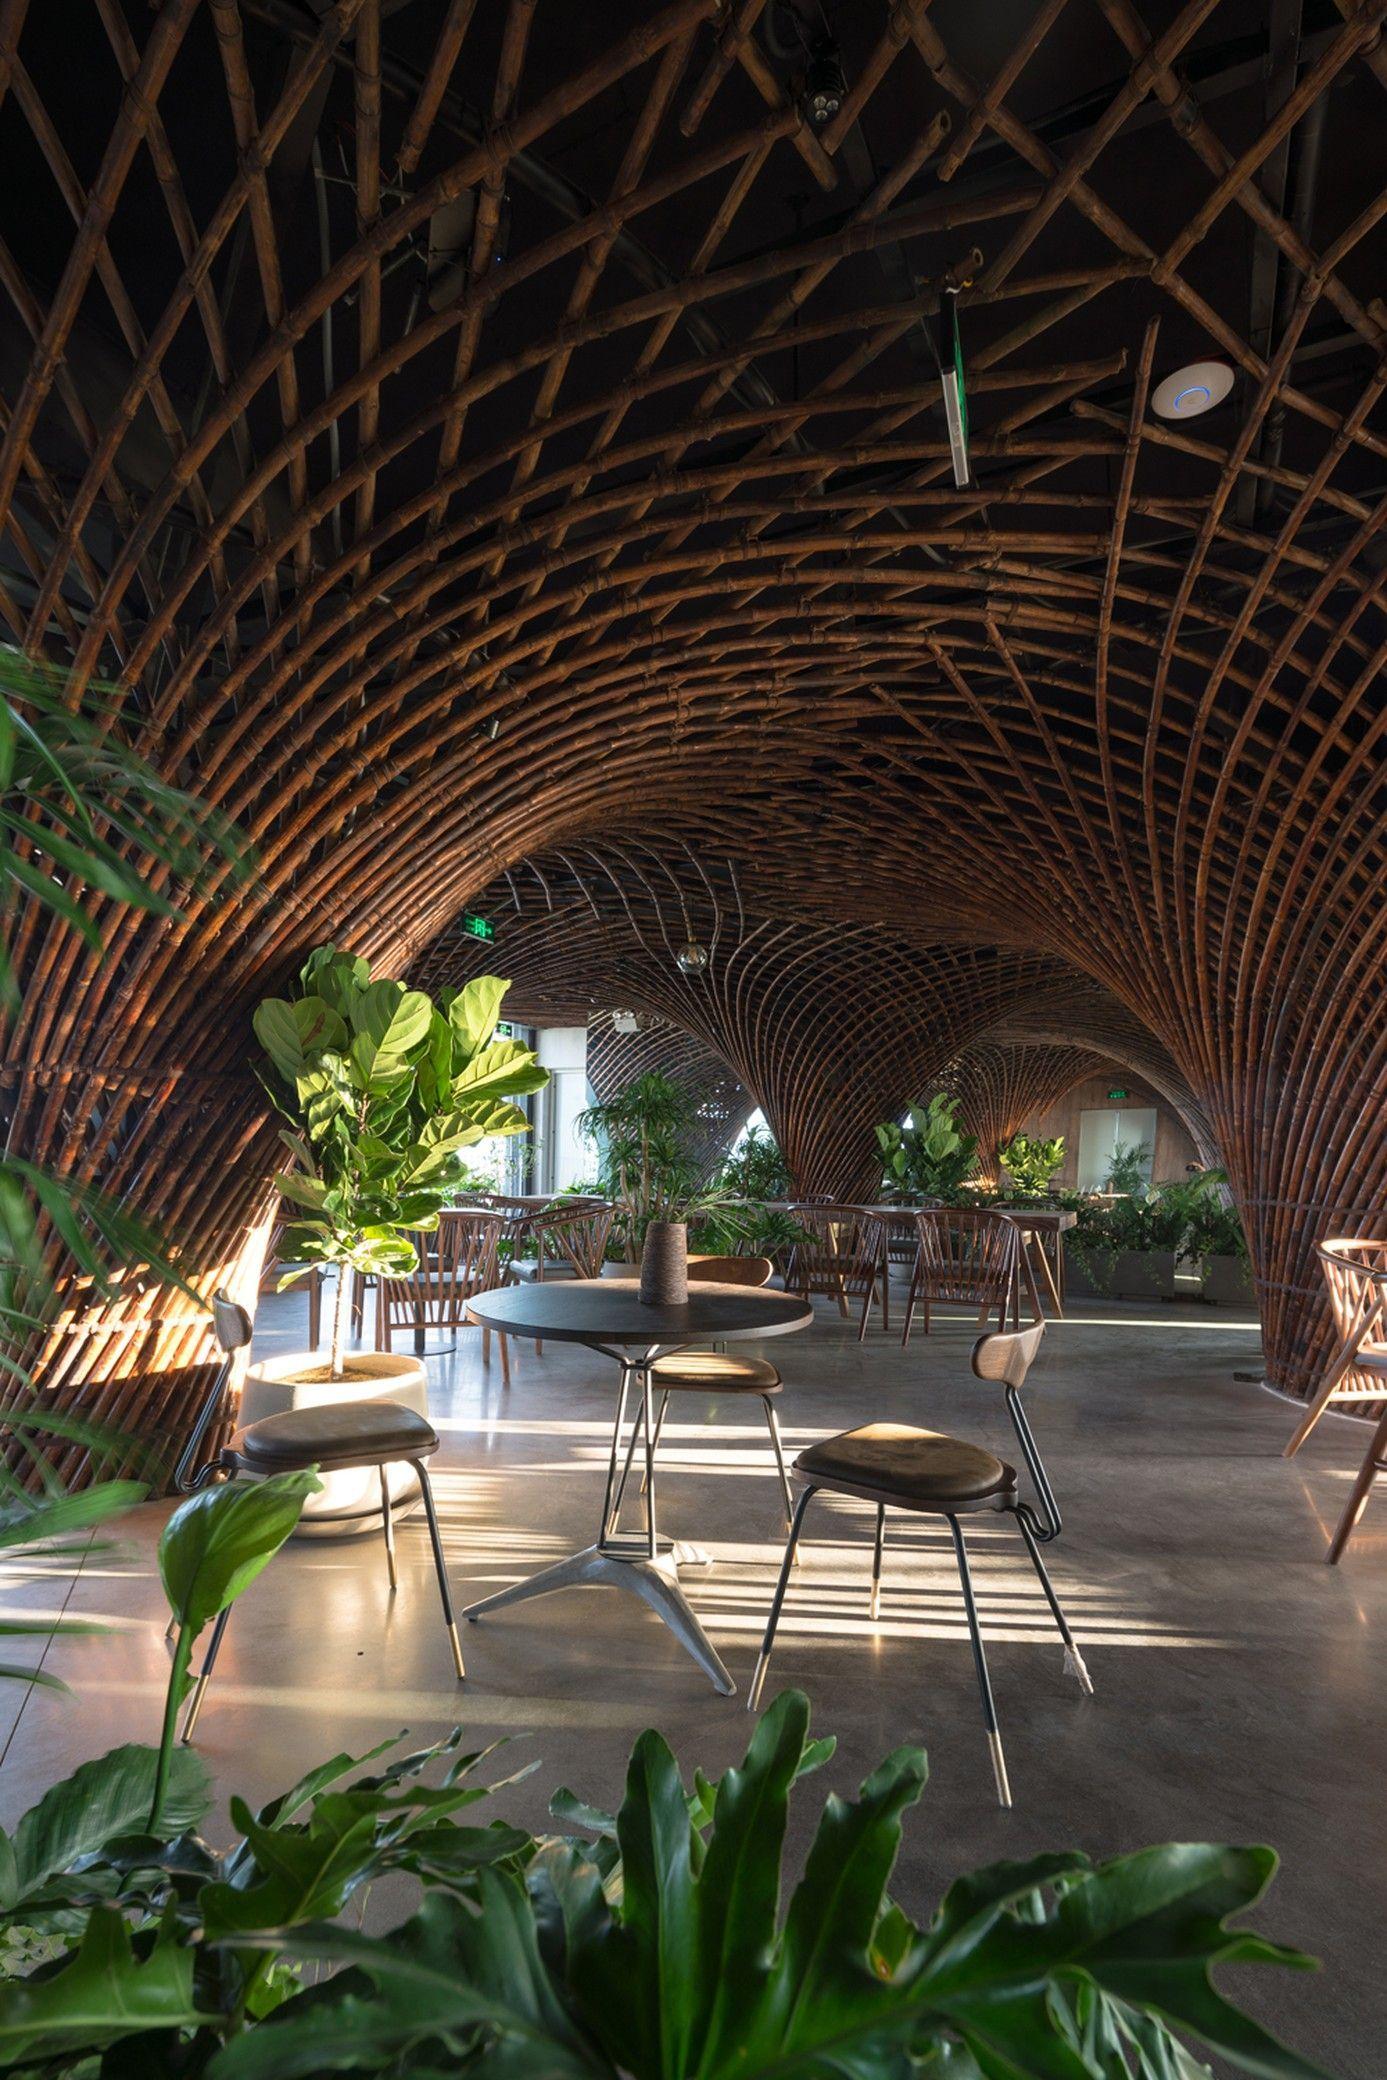 Nocenco Cafe Vtn Architects Arch2o Com In 2020 Bamboo Structure Bamboo Architecture Architect